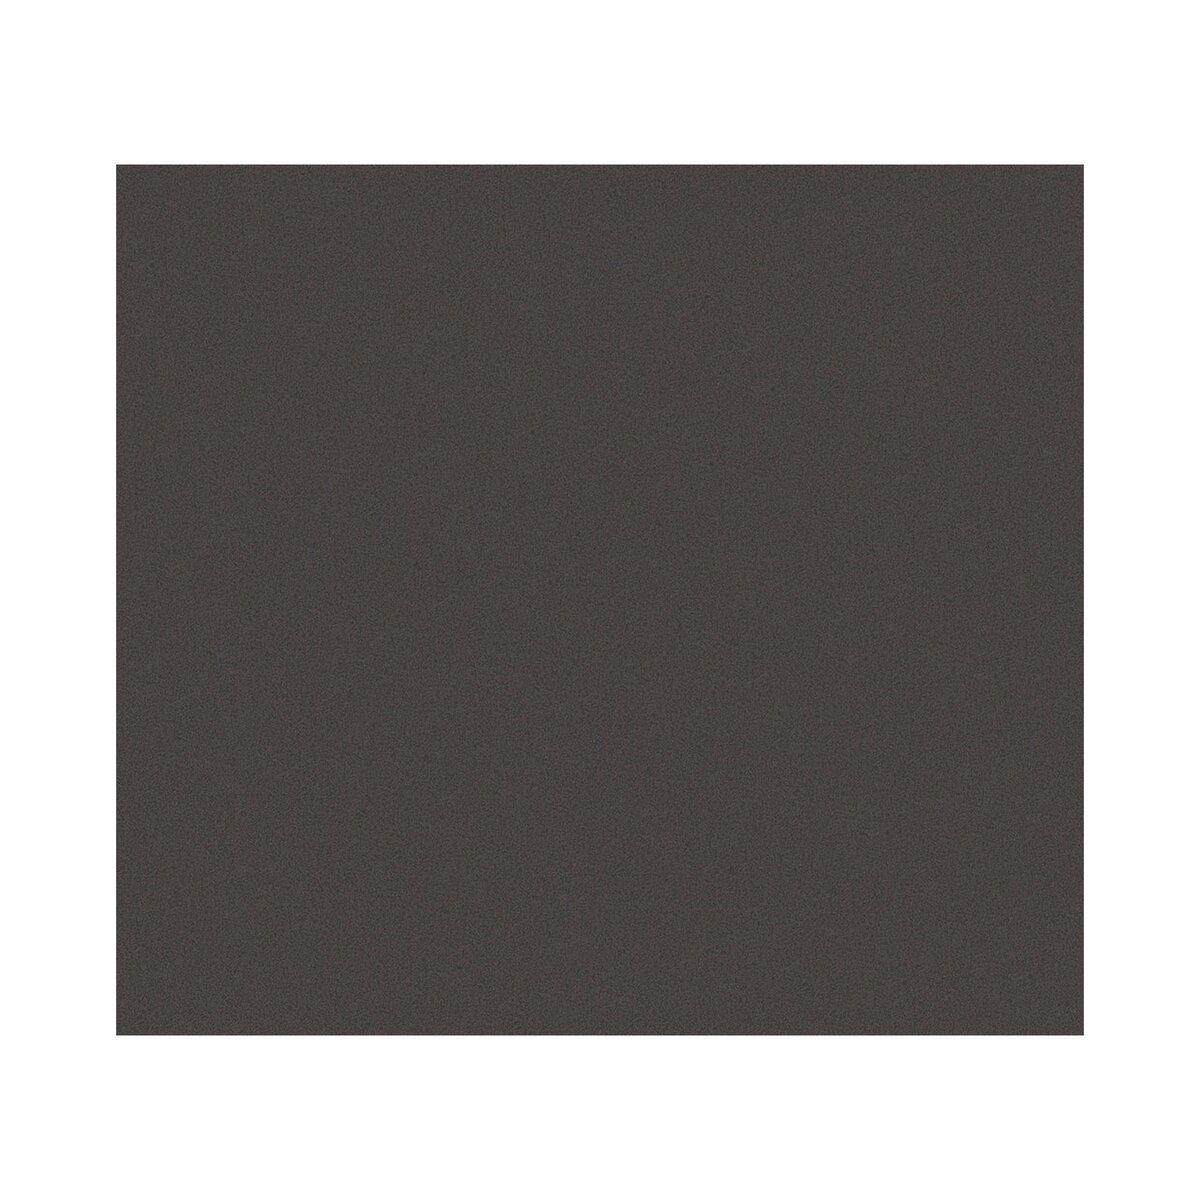 Bild 1 von AS_Creation -             A.S. Création Vliestapete Metropolitan Stories 'Lizzy' London, Uni flat schwarz 10,05 x 0,53 m